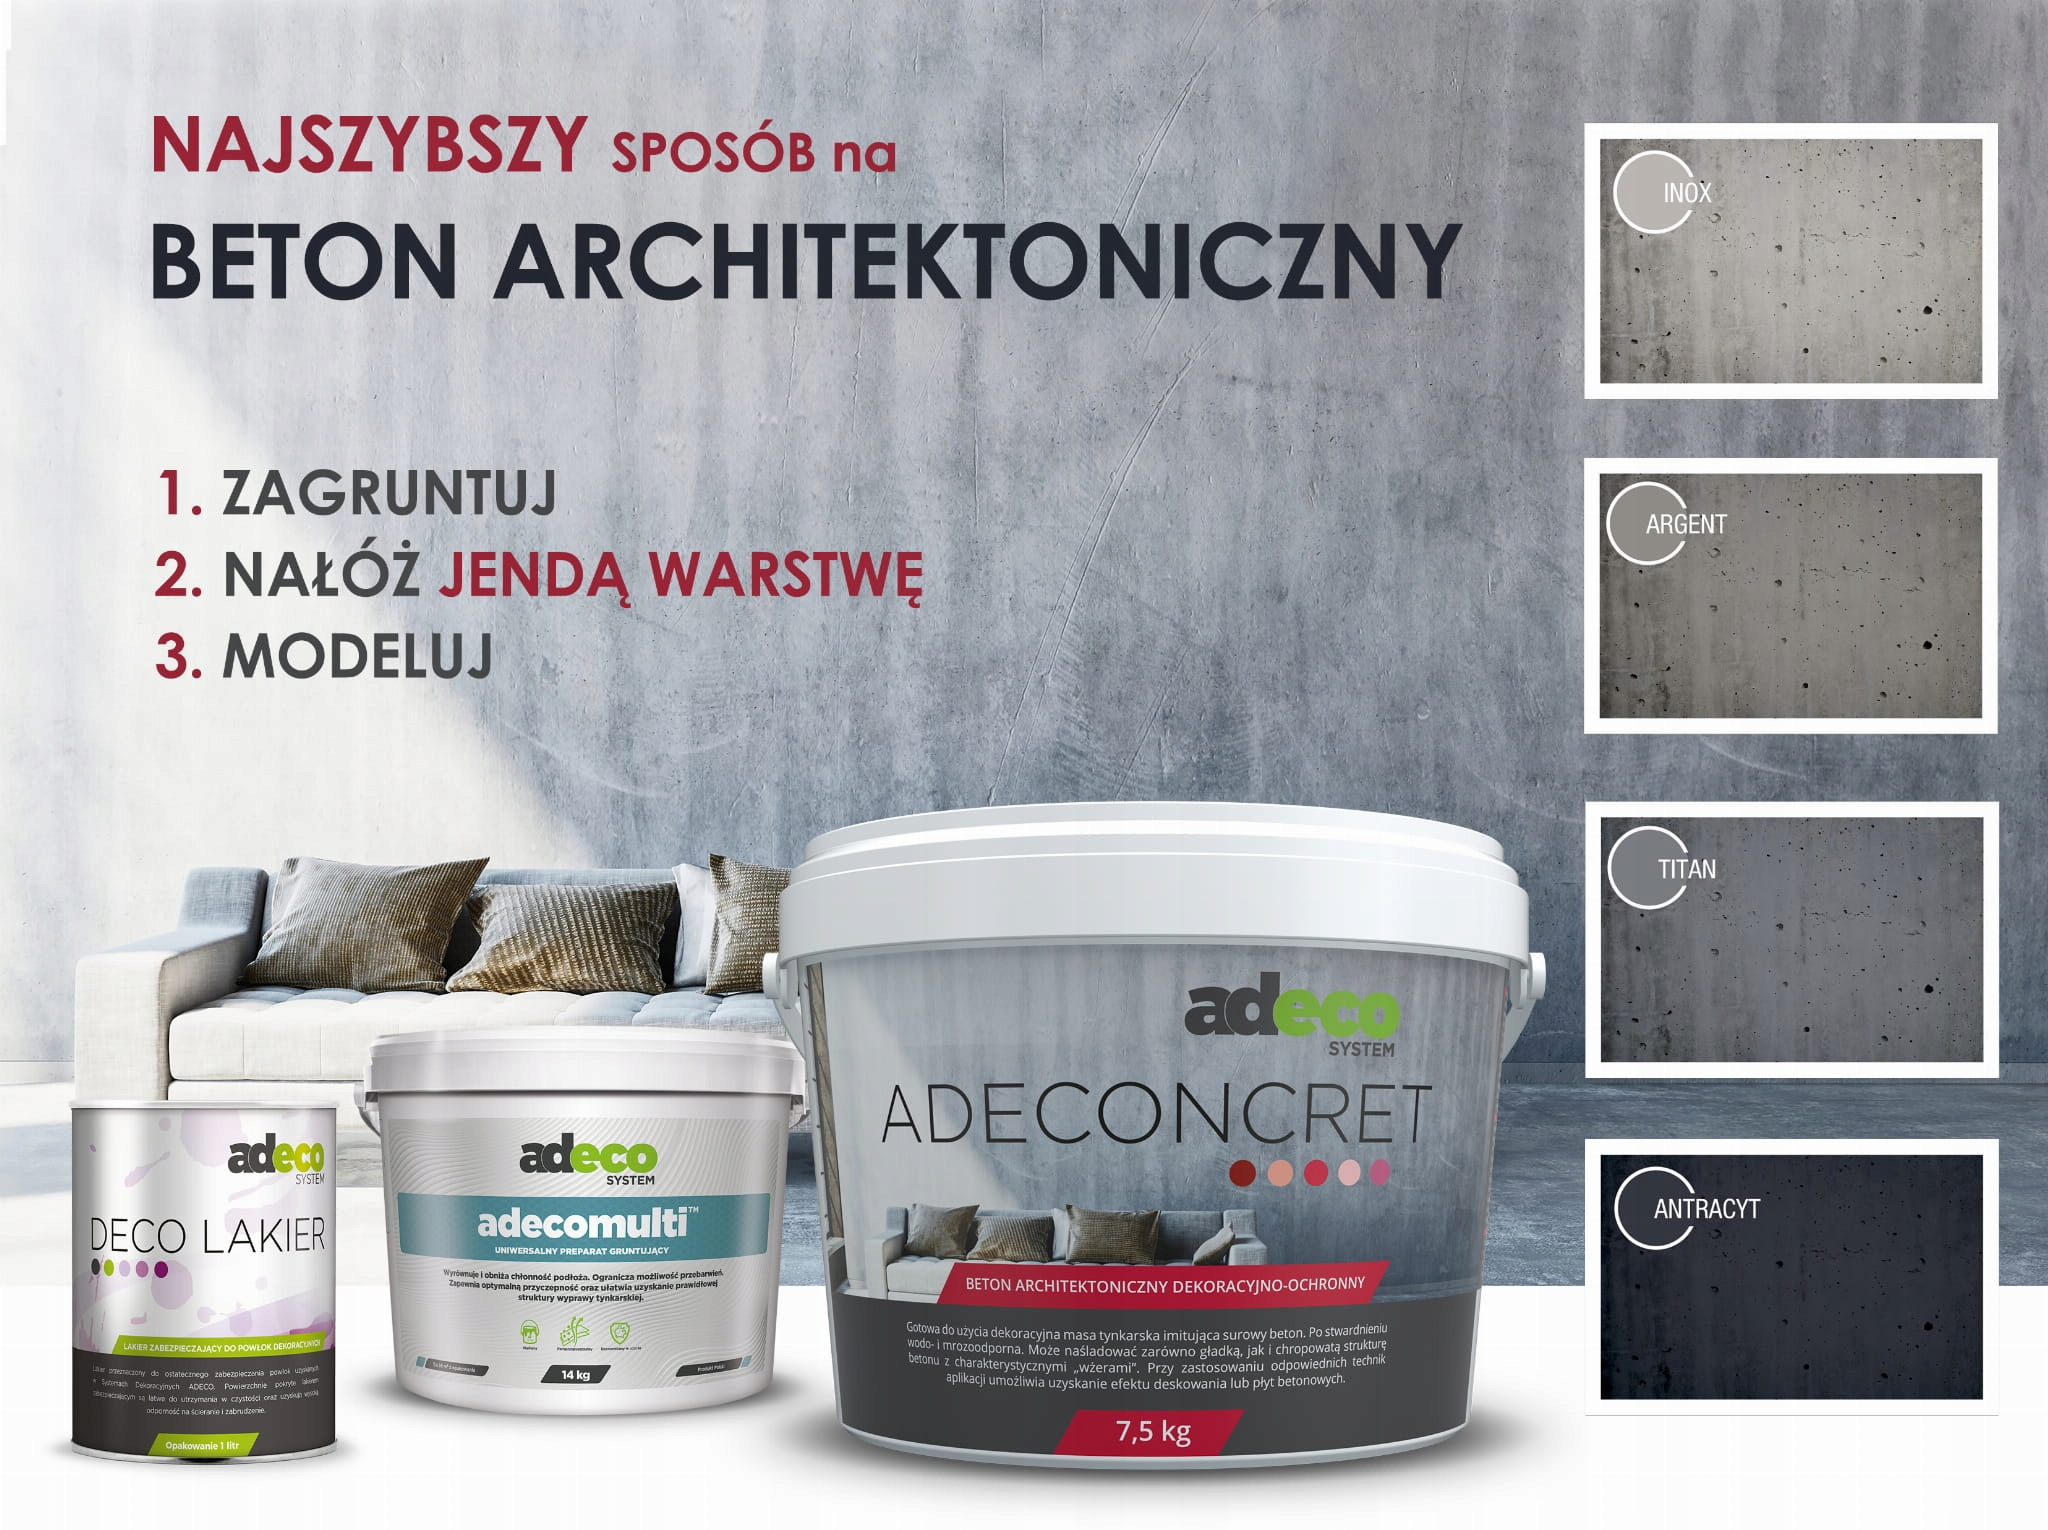 Beton architektoniczny plamoodporny zestaw